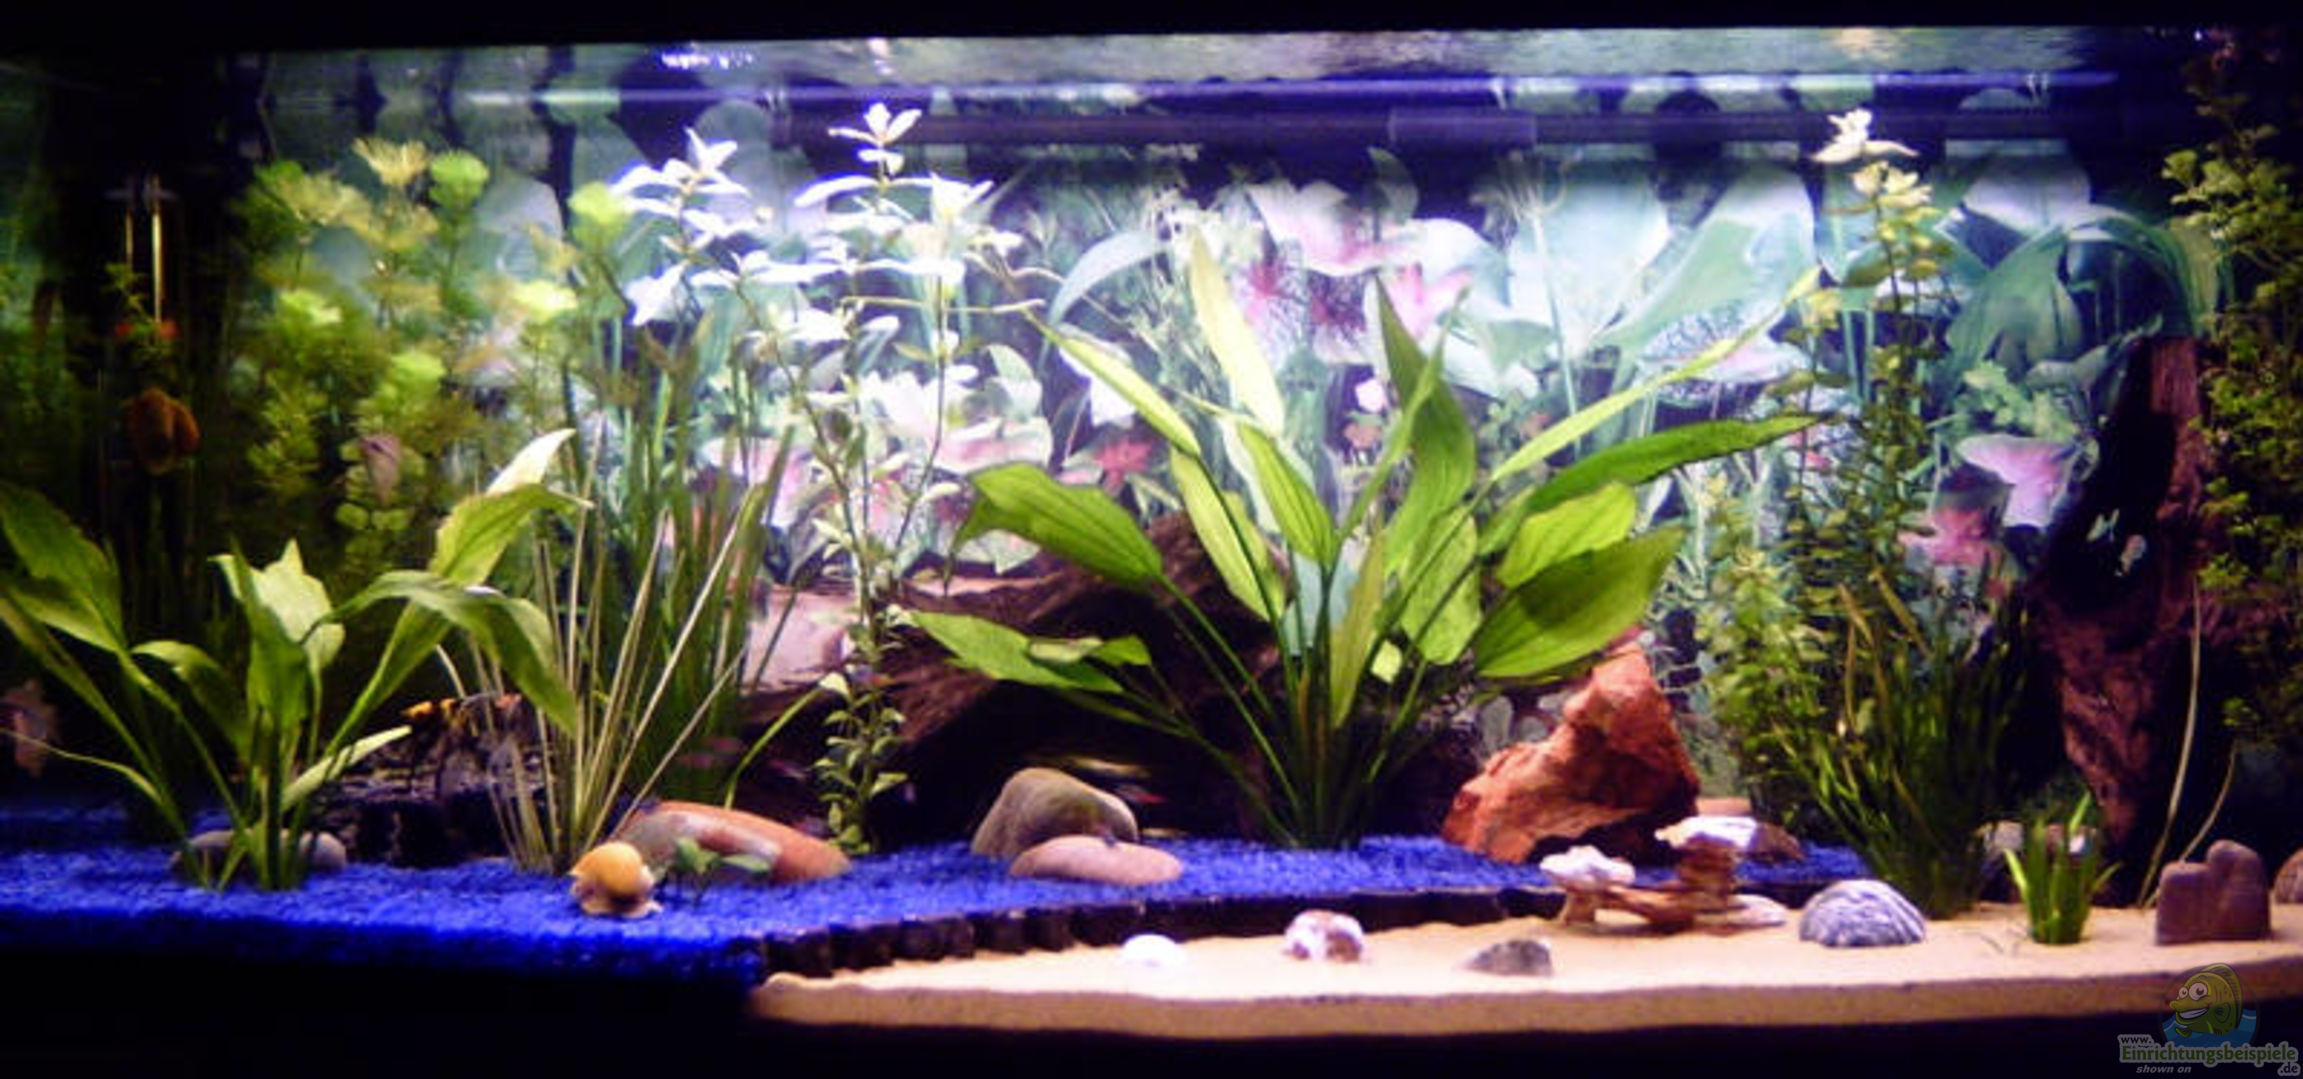 aquarium von stonedman becken 2956. Black Bedroom Furniture Sets. Home Design Ideas